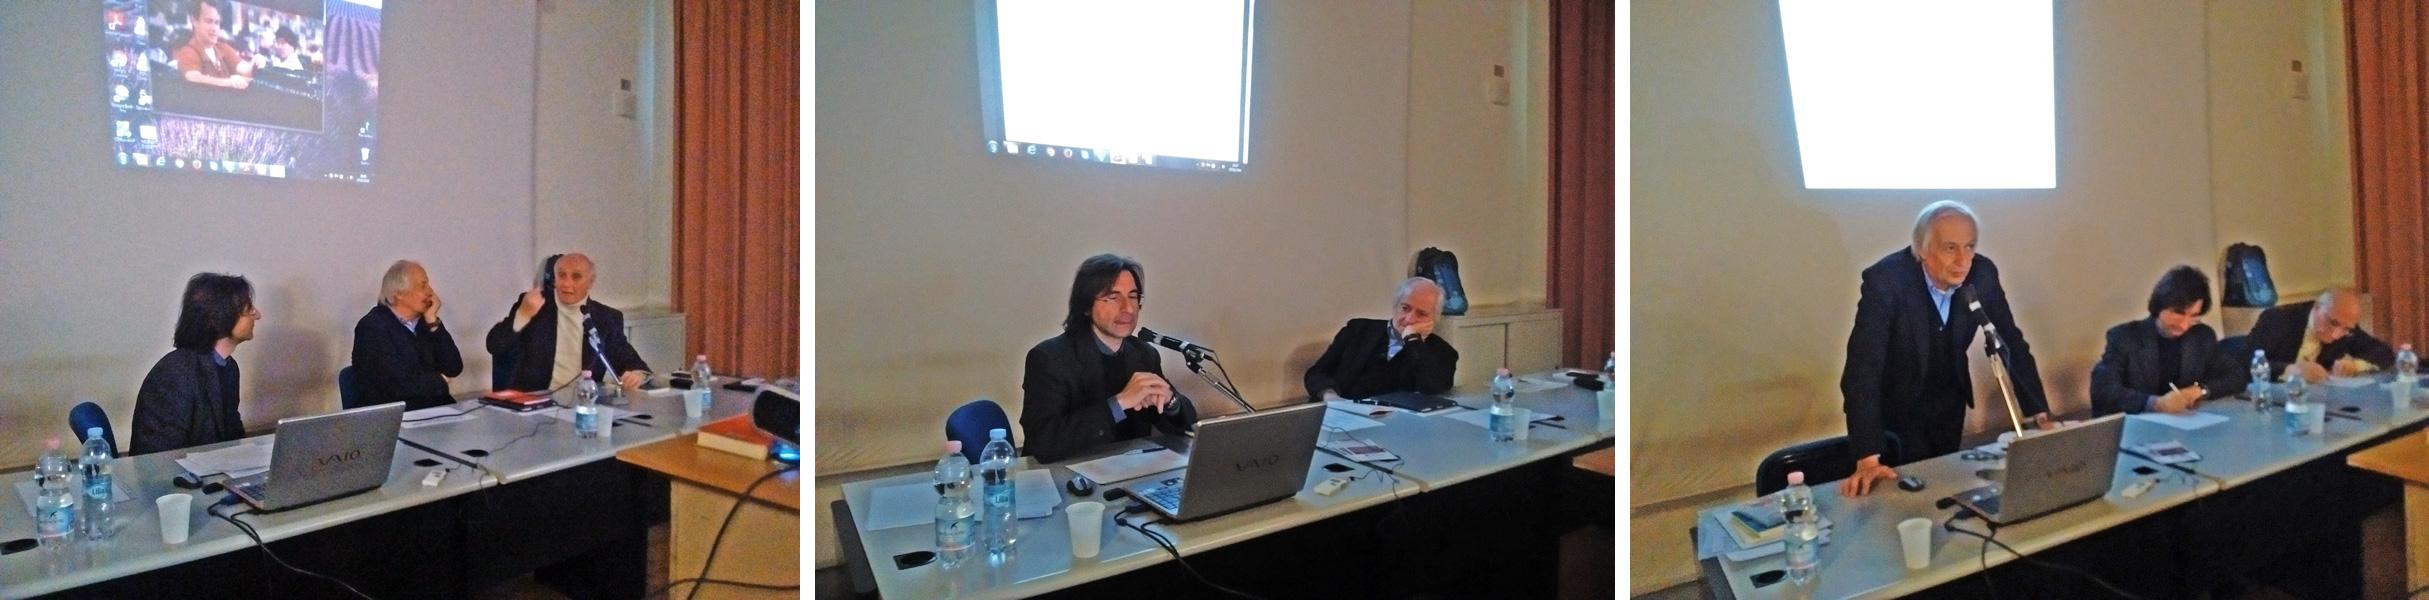 Giovanni Bianchi, Vincenzo Sabatino e Maurizio Franzini